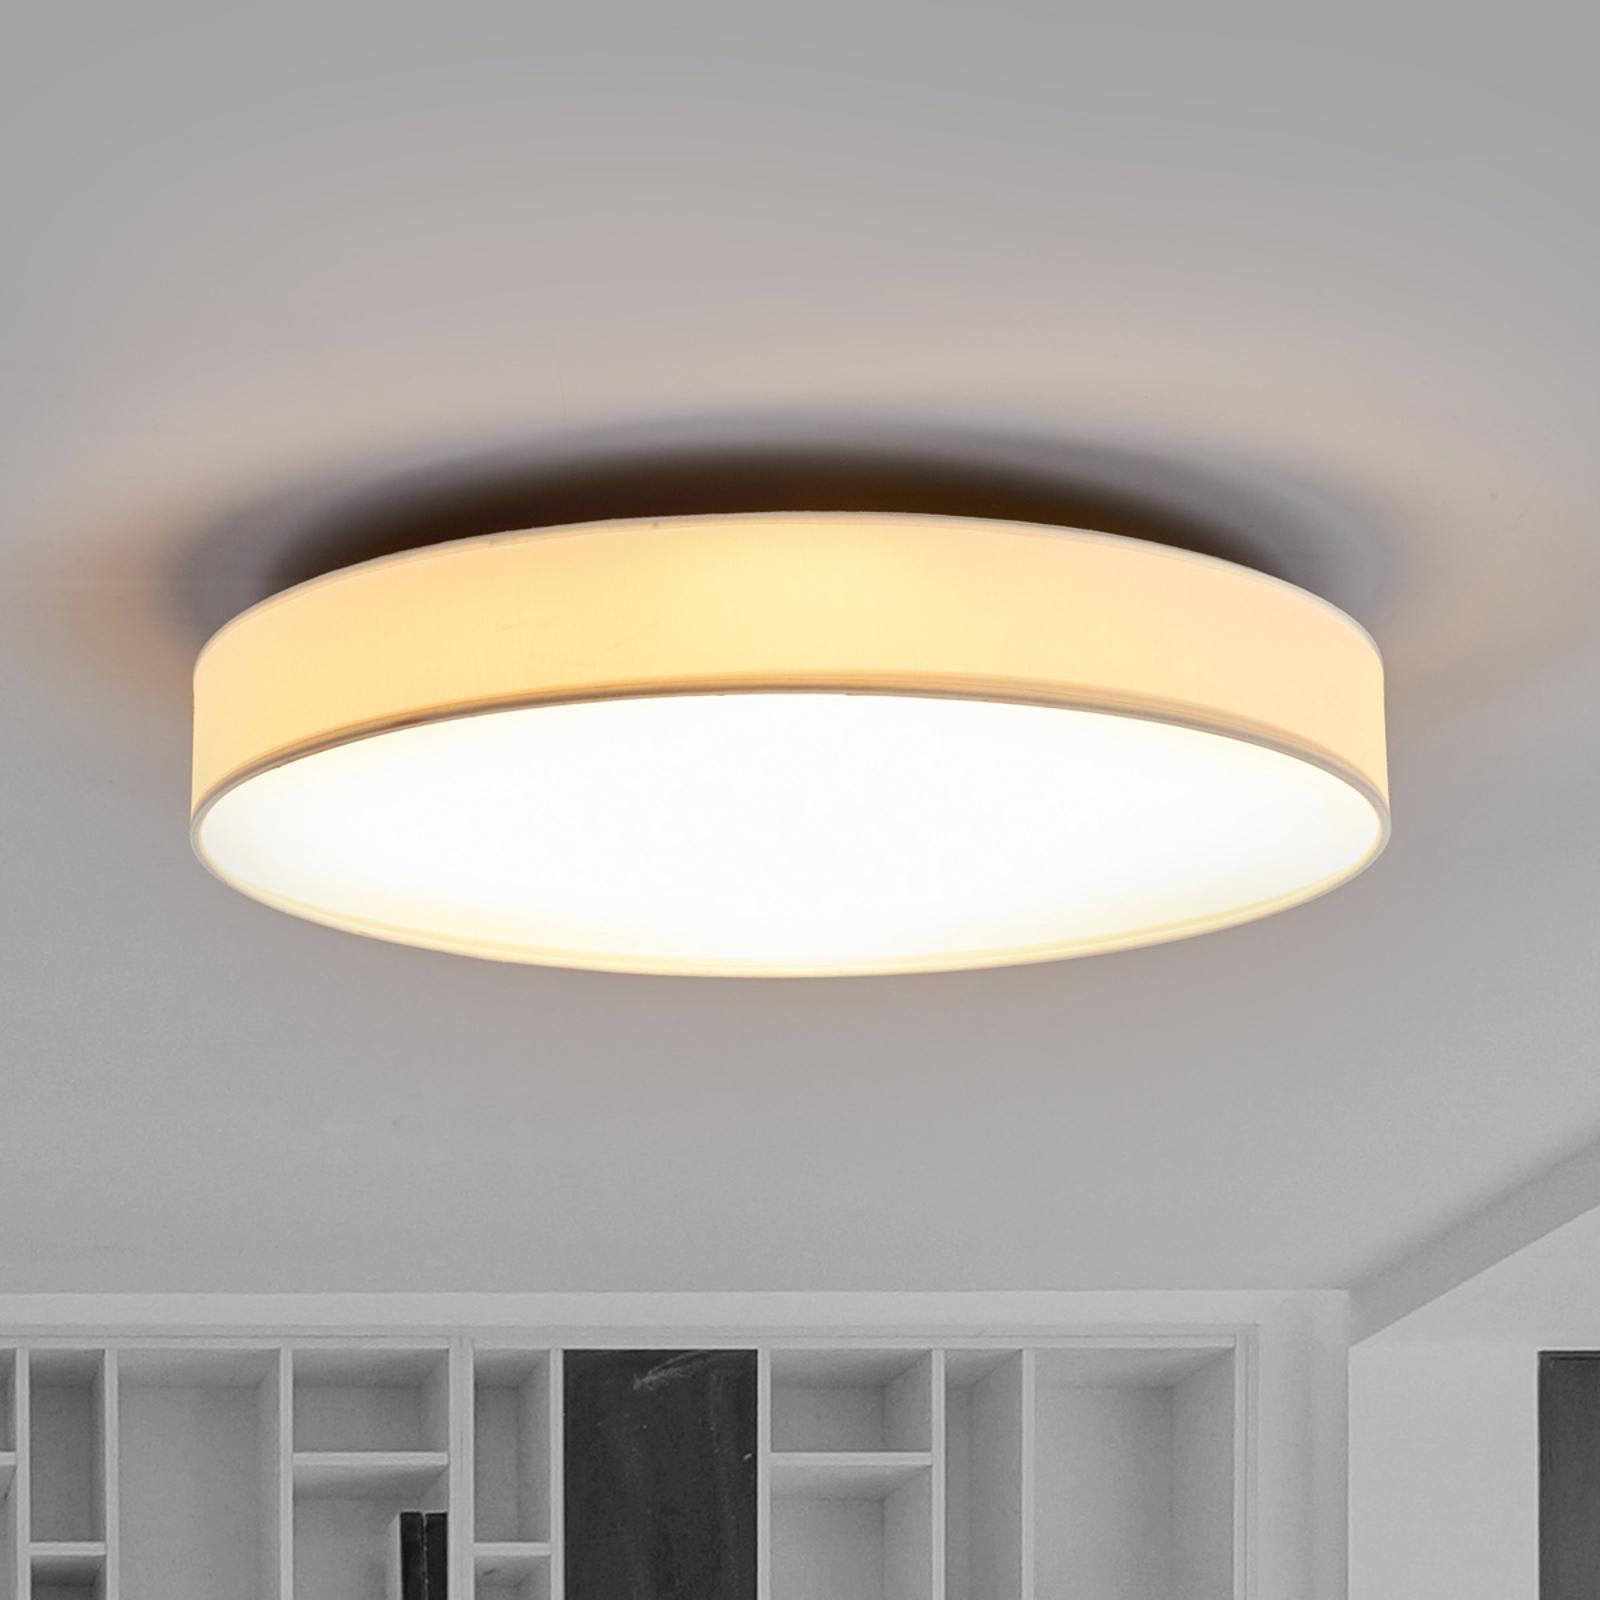 LED-taklampa Saira i textil, 50 cm, vit